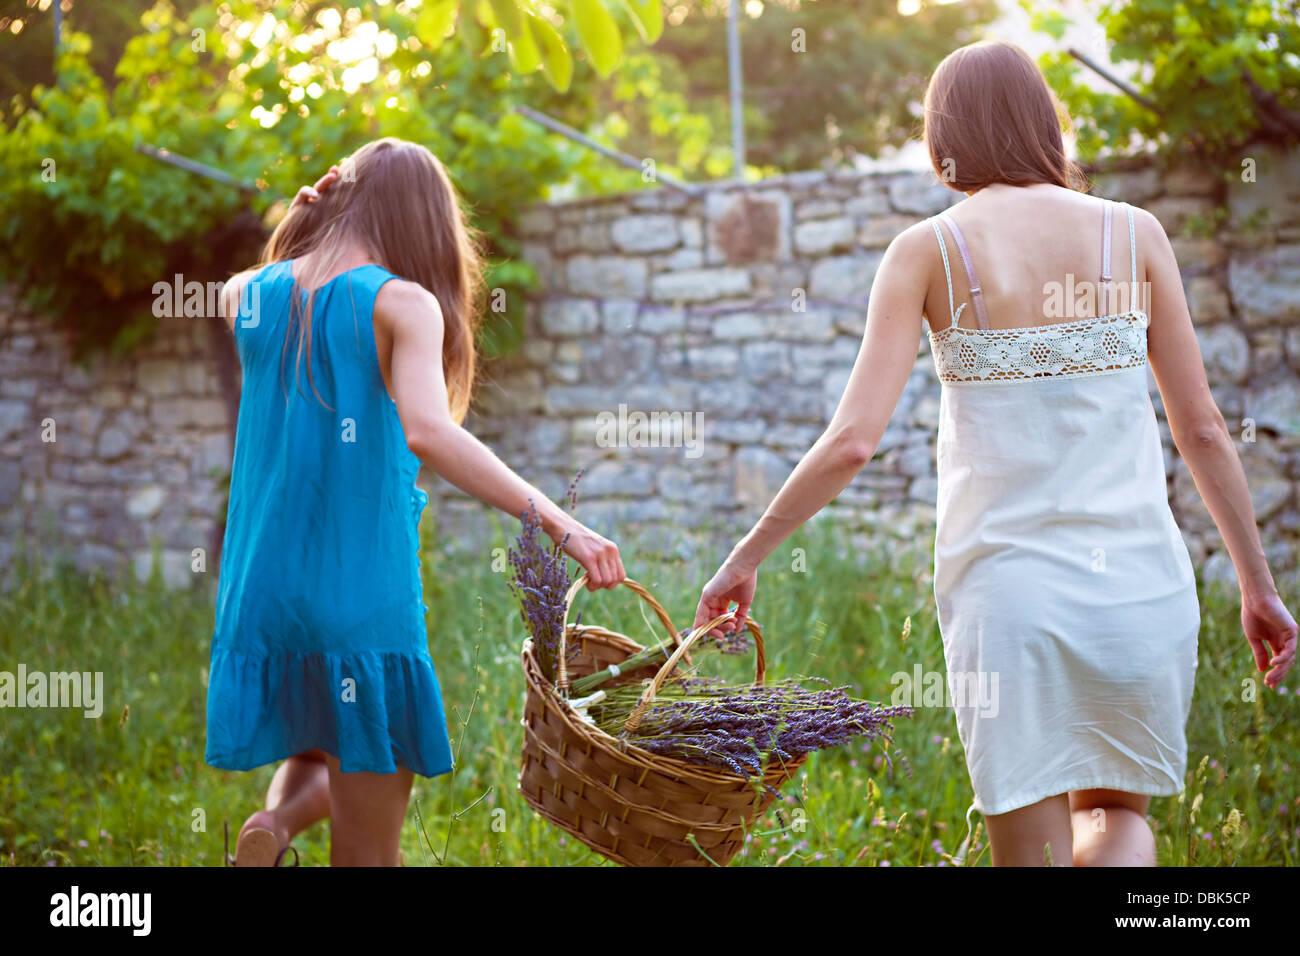 zwei frauen korb mit lavendel blumen kroatien dalmatien europa stockfoto bild 58813686 alamy. Black Bedroom Furniture Sets. Home Design Ideas